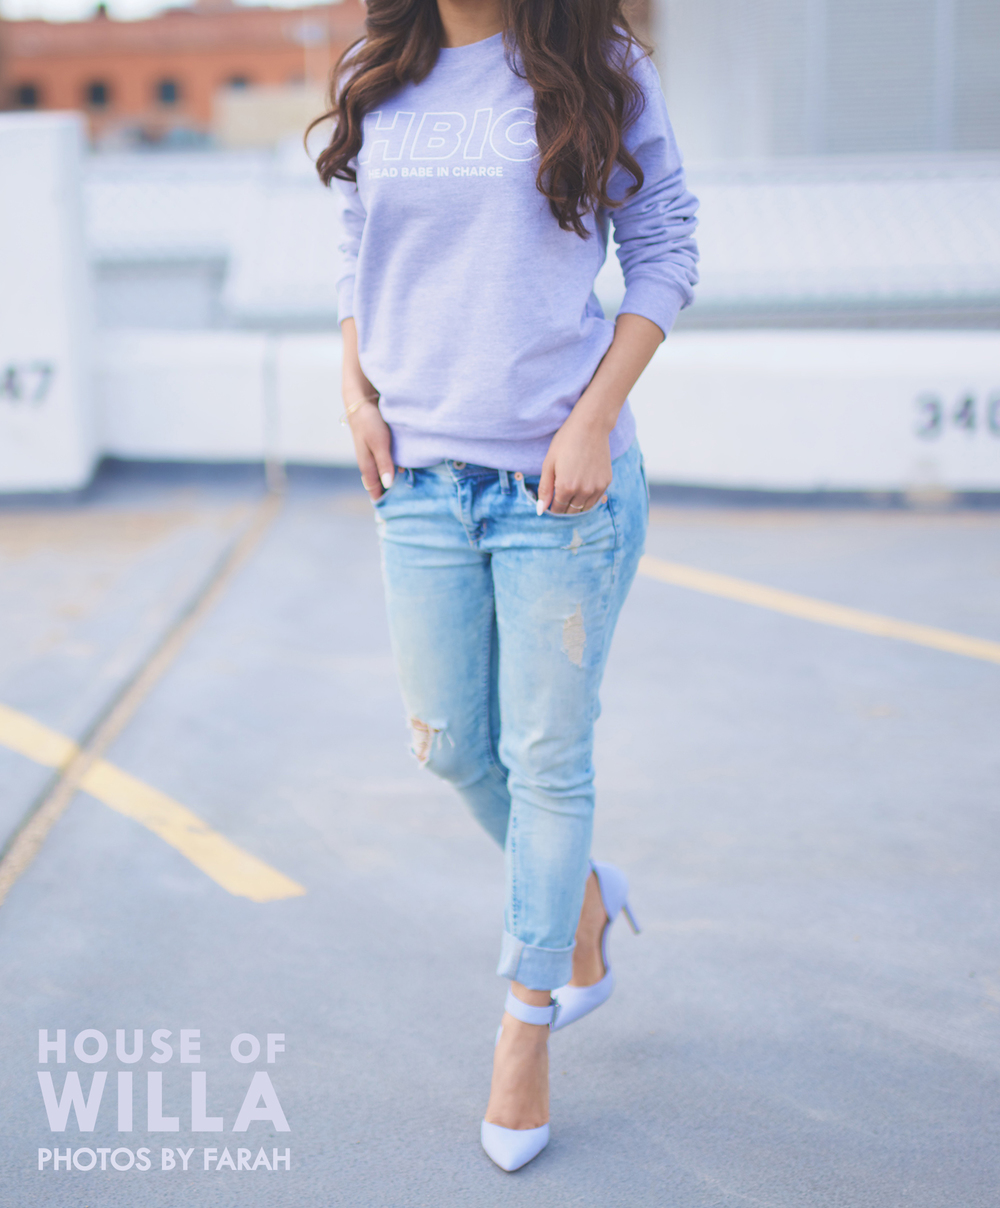 houseofwilla_hbic.jpg